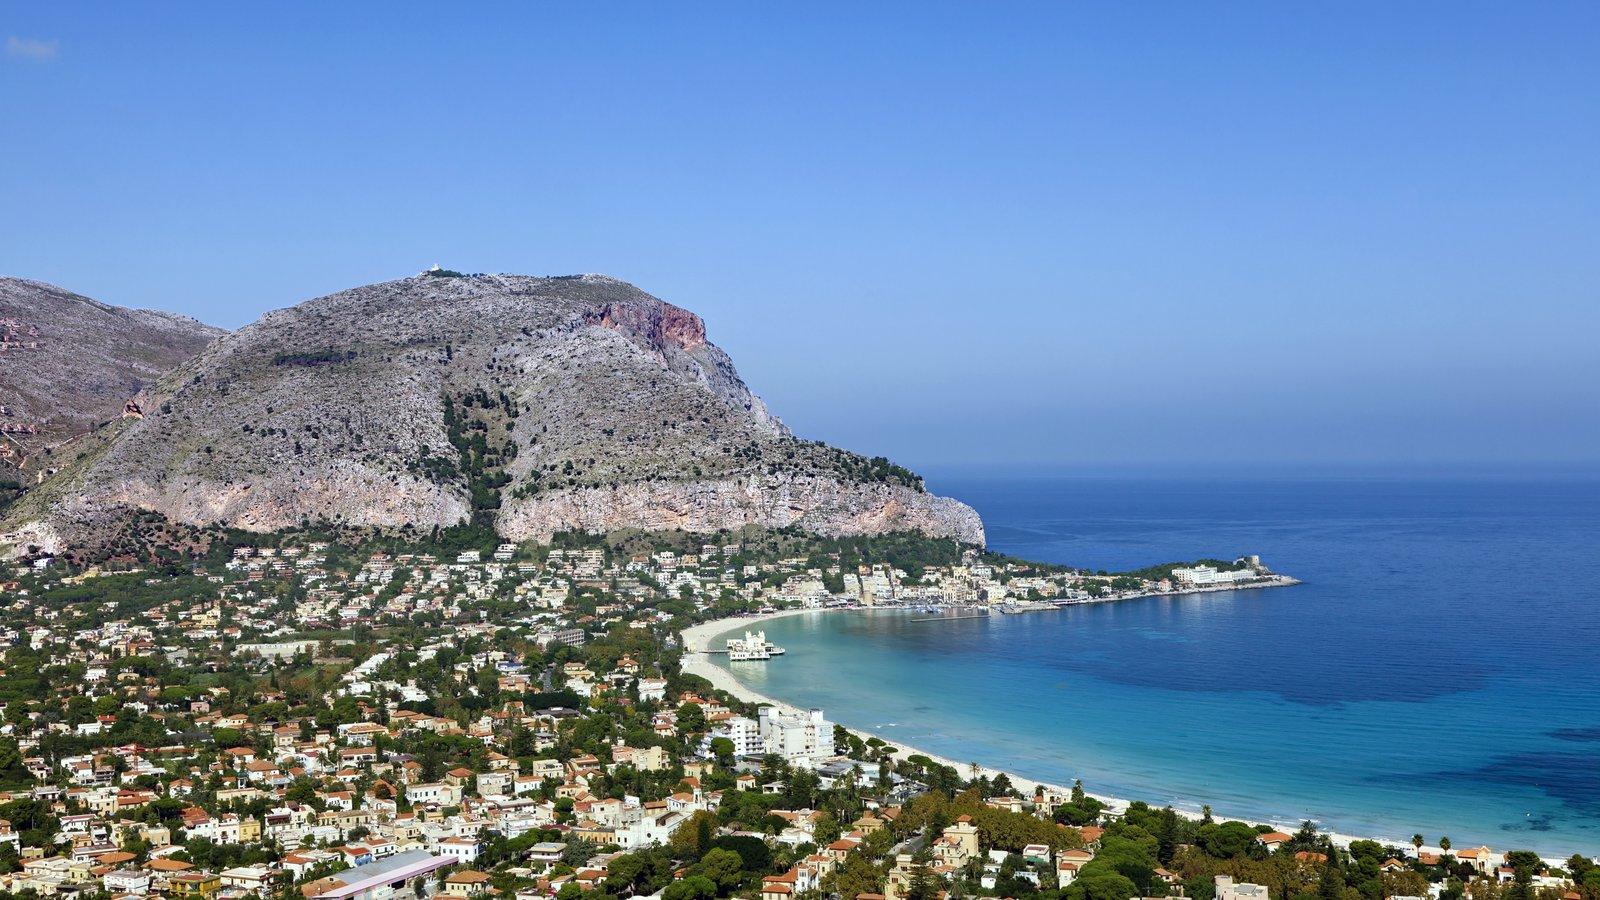 Mondello which includes mountains, a coastal town and general coastal views